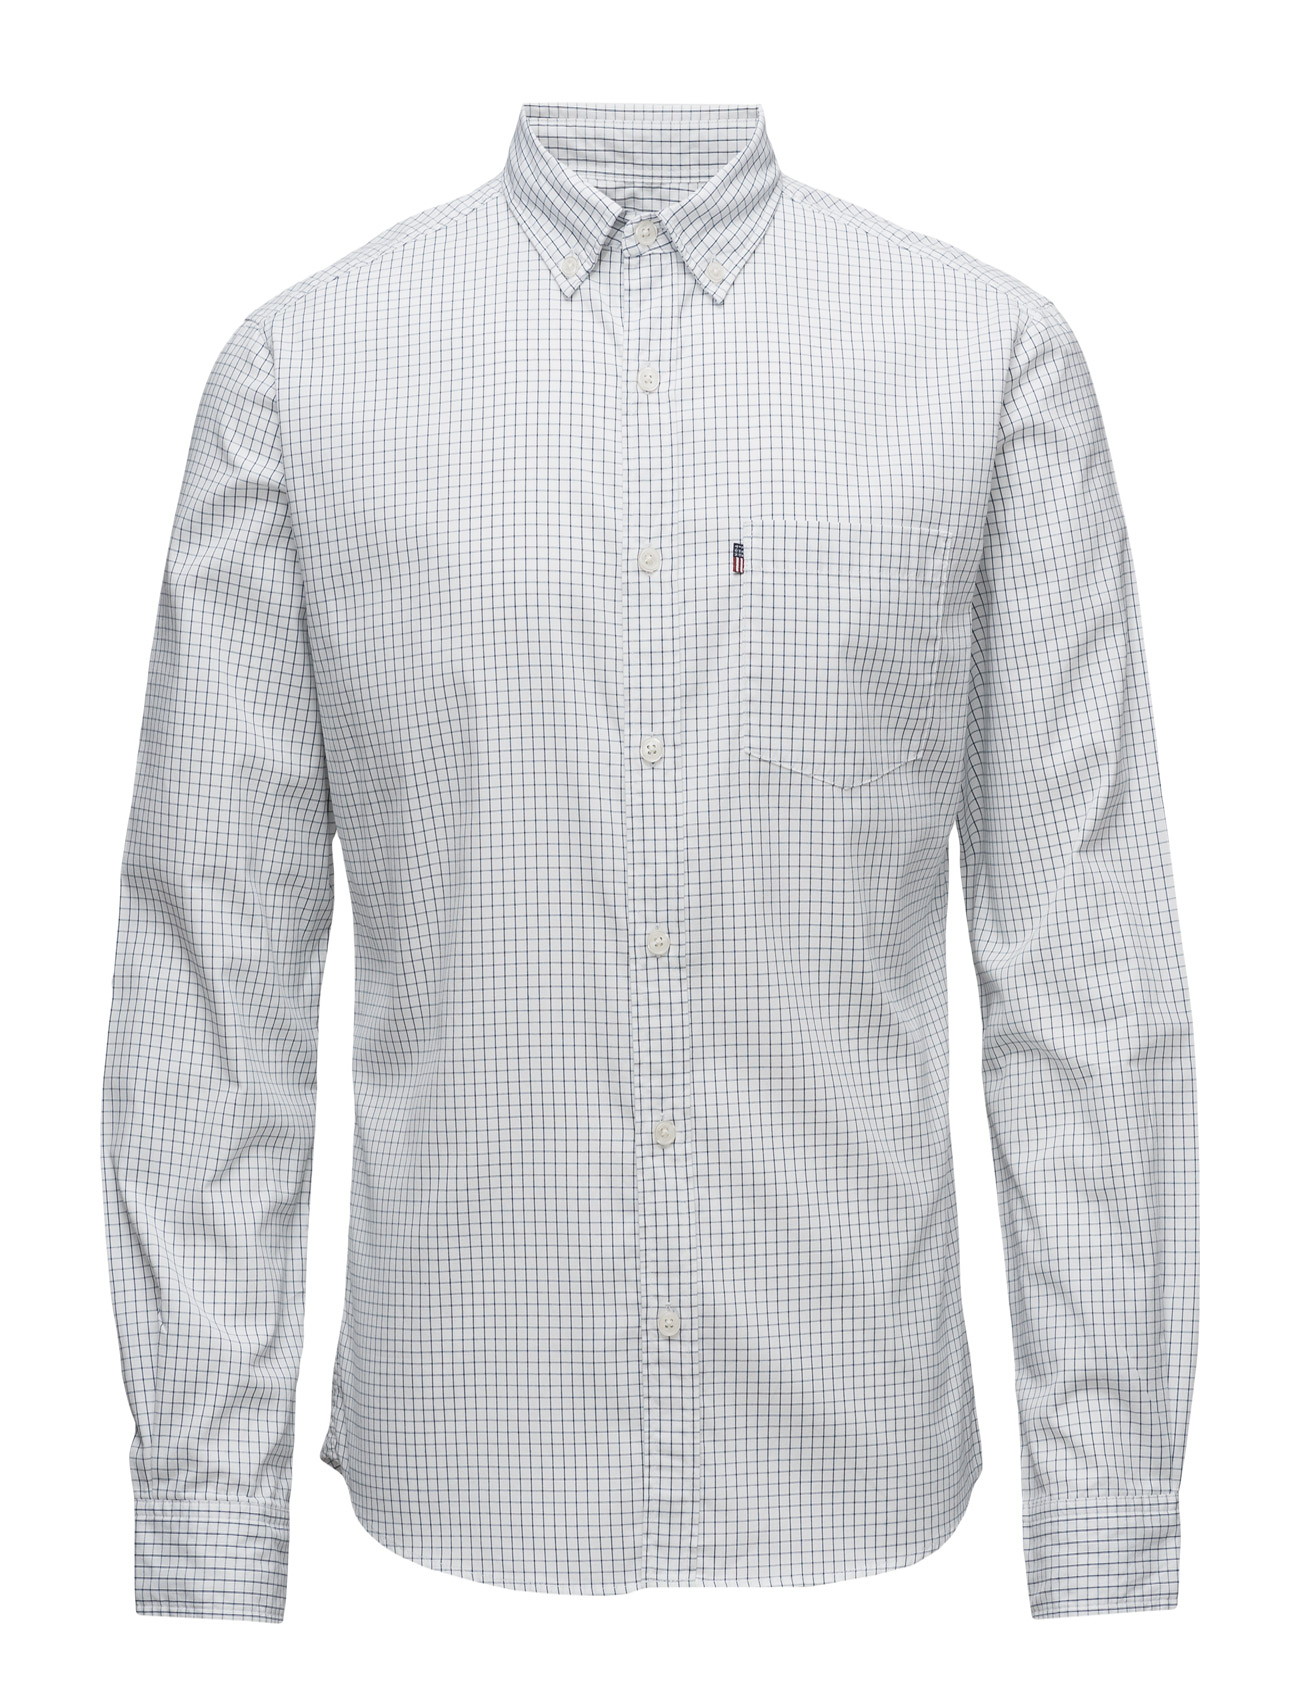 Peter Light Oxford Shirt Lexington Company Casual sko til Mænd i